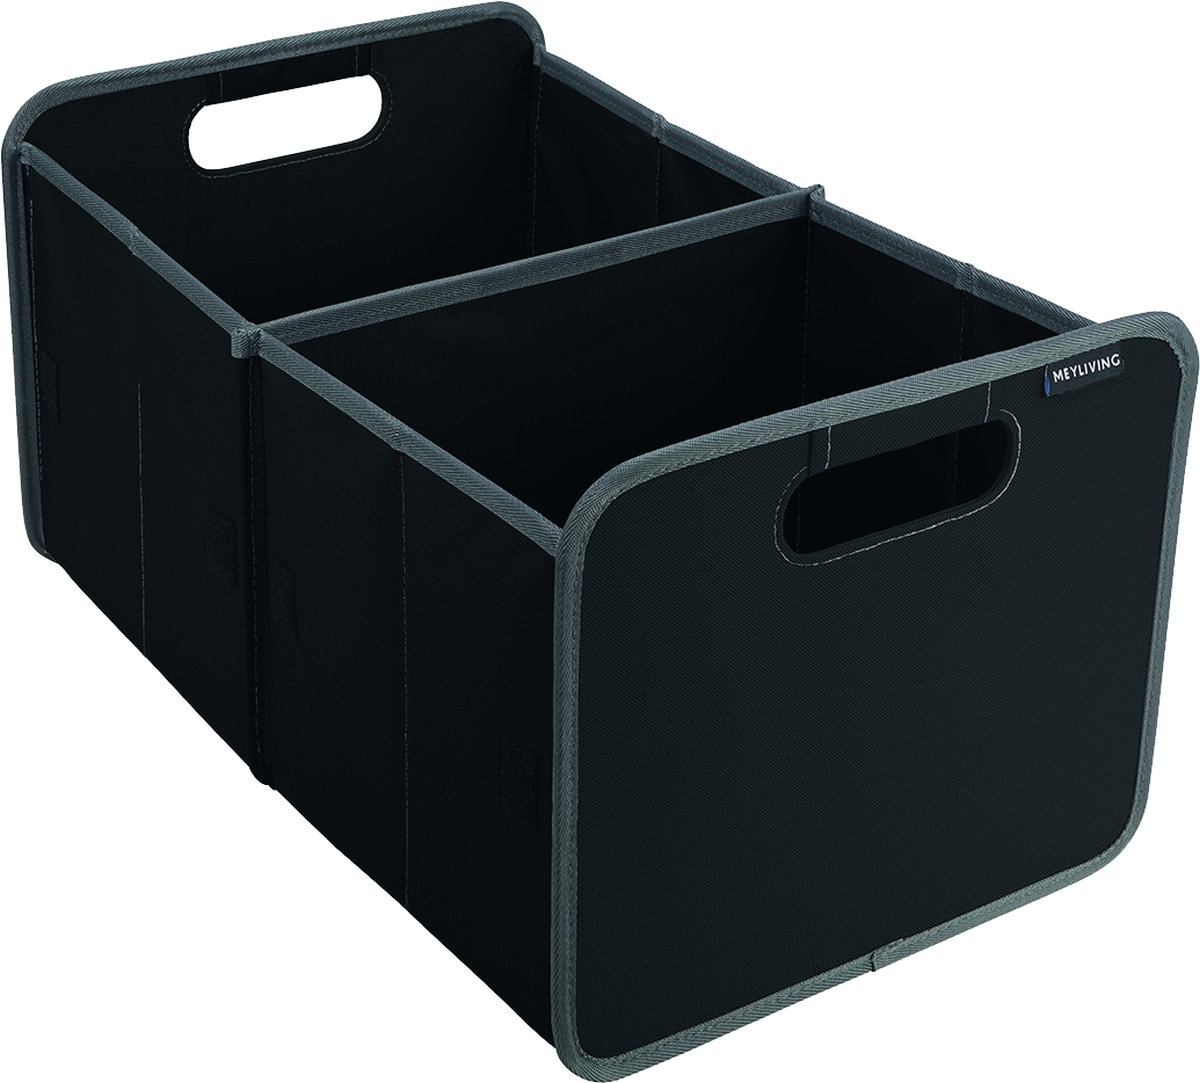 Meori Faltbox Meyliving L Black